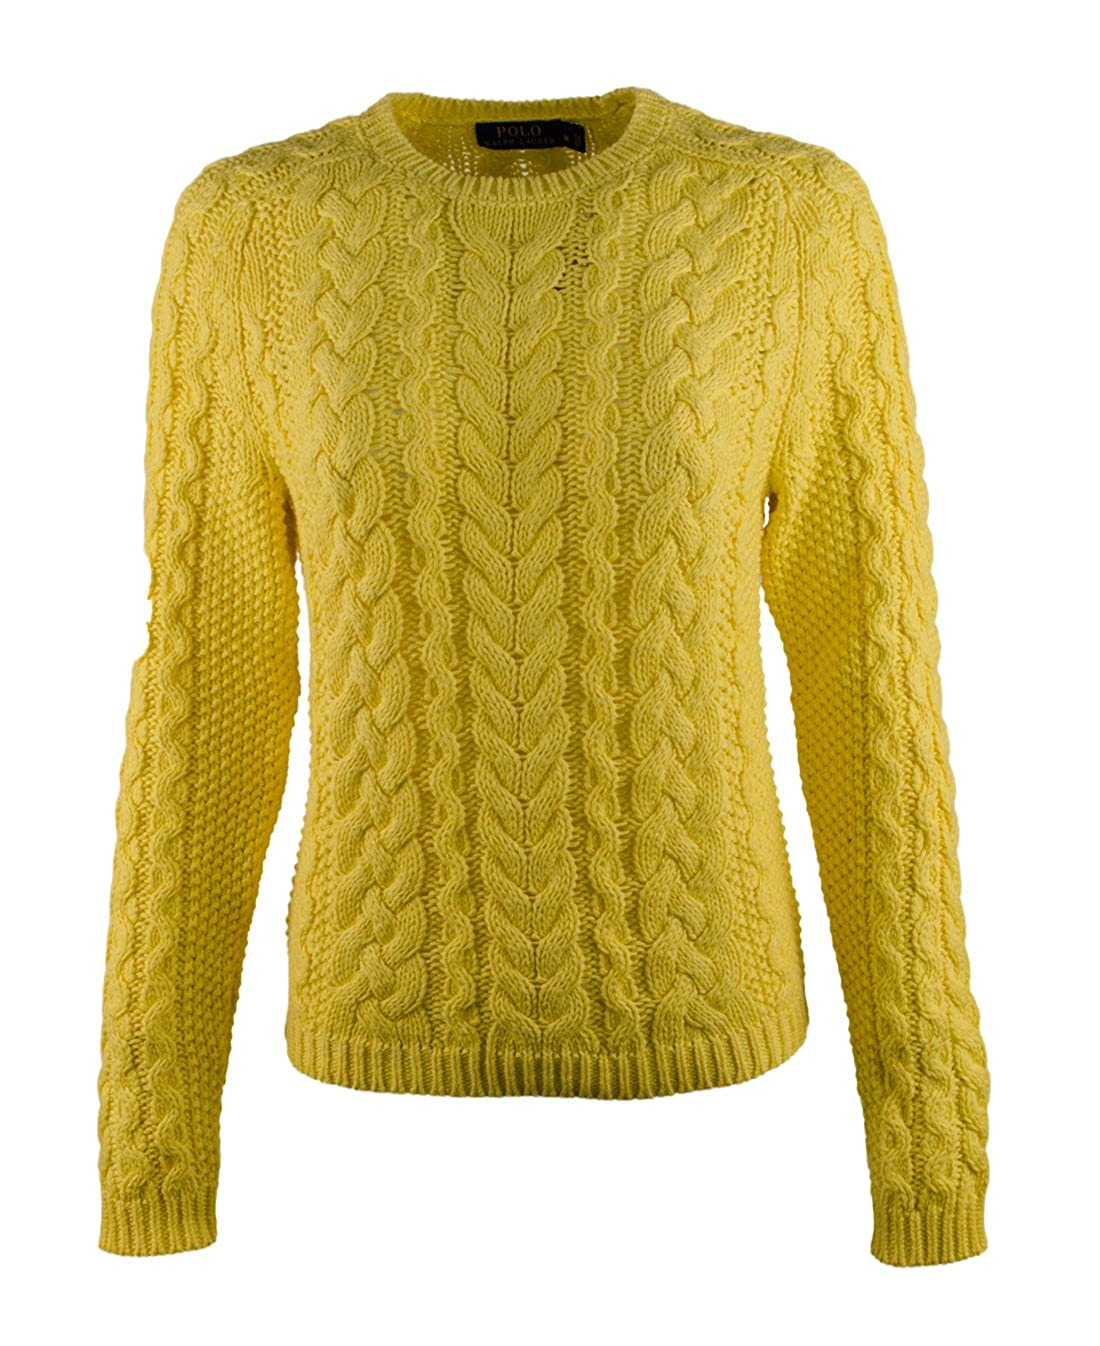 7993c1f24c Polo Ralph Lauren Women's Aran-Knit Crewneck Sweater-LC-XS at Amazon ...